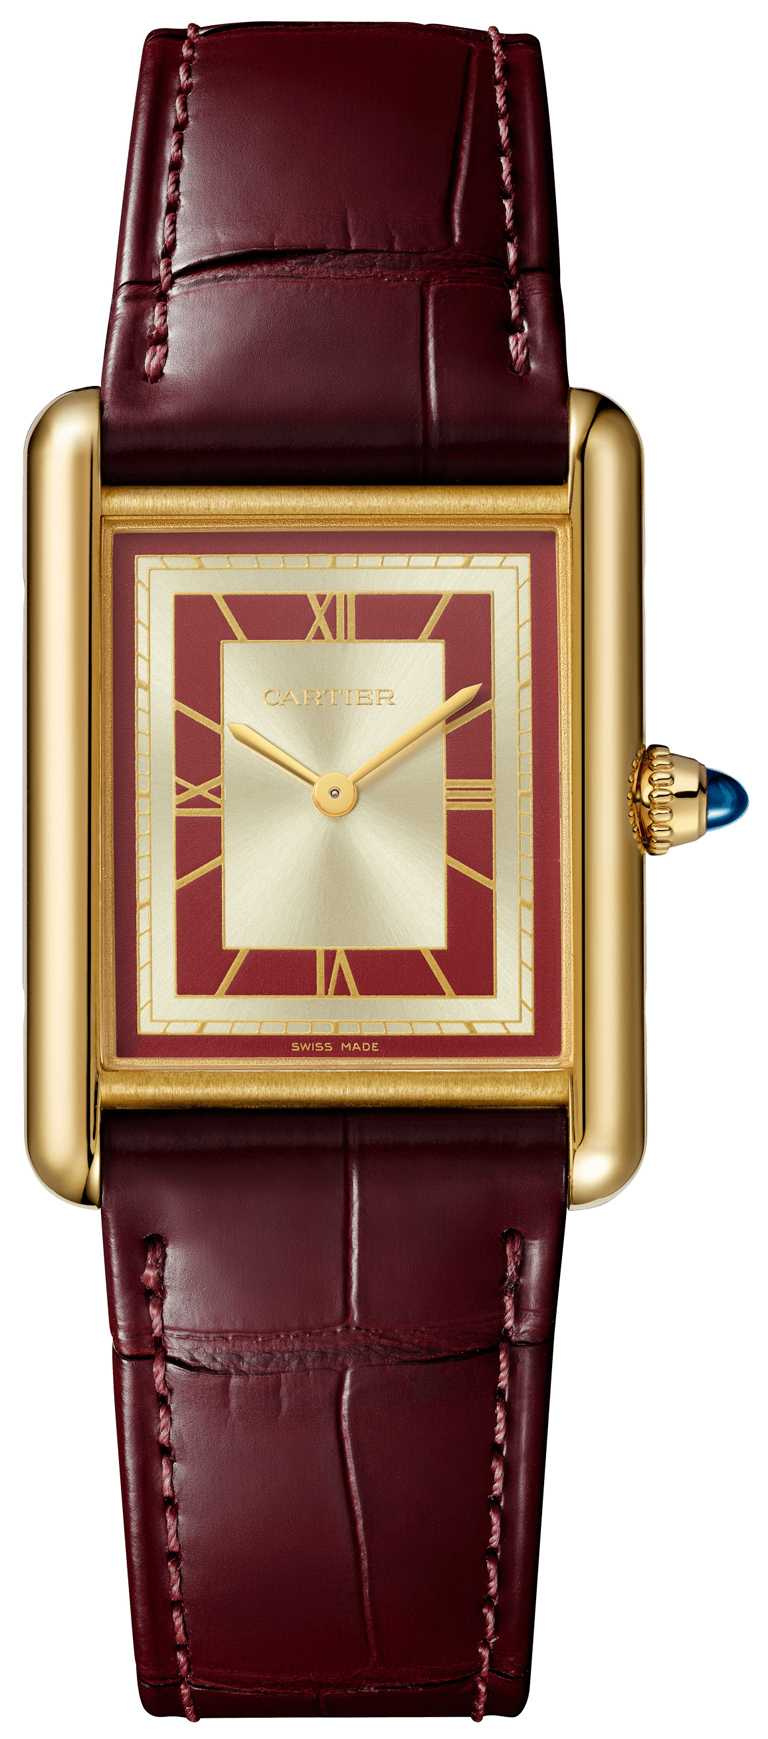 Cartier「Tank Louis Cartier」腕錶(大型款),黃K金錶殼,手動上鏈機械機芯,紅色及珠光錶盤,半啞光深紅色鱷魚皮錶帶╱405,000元。(圖╱Cartier提供)